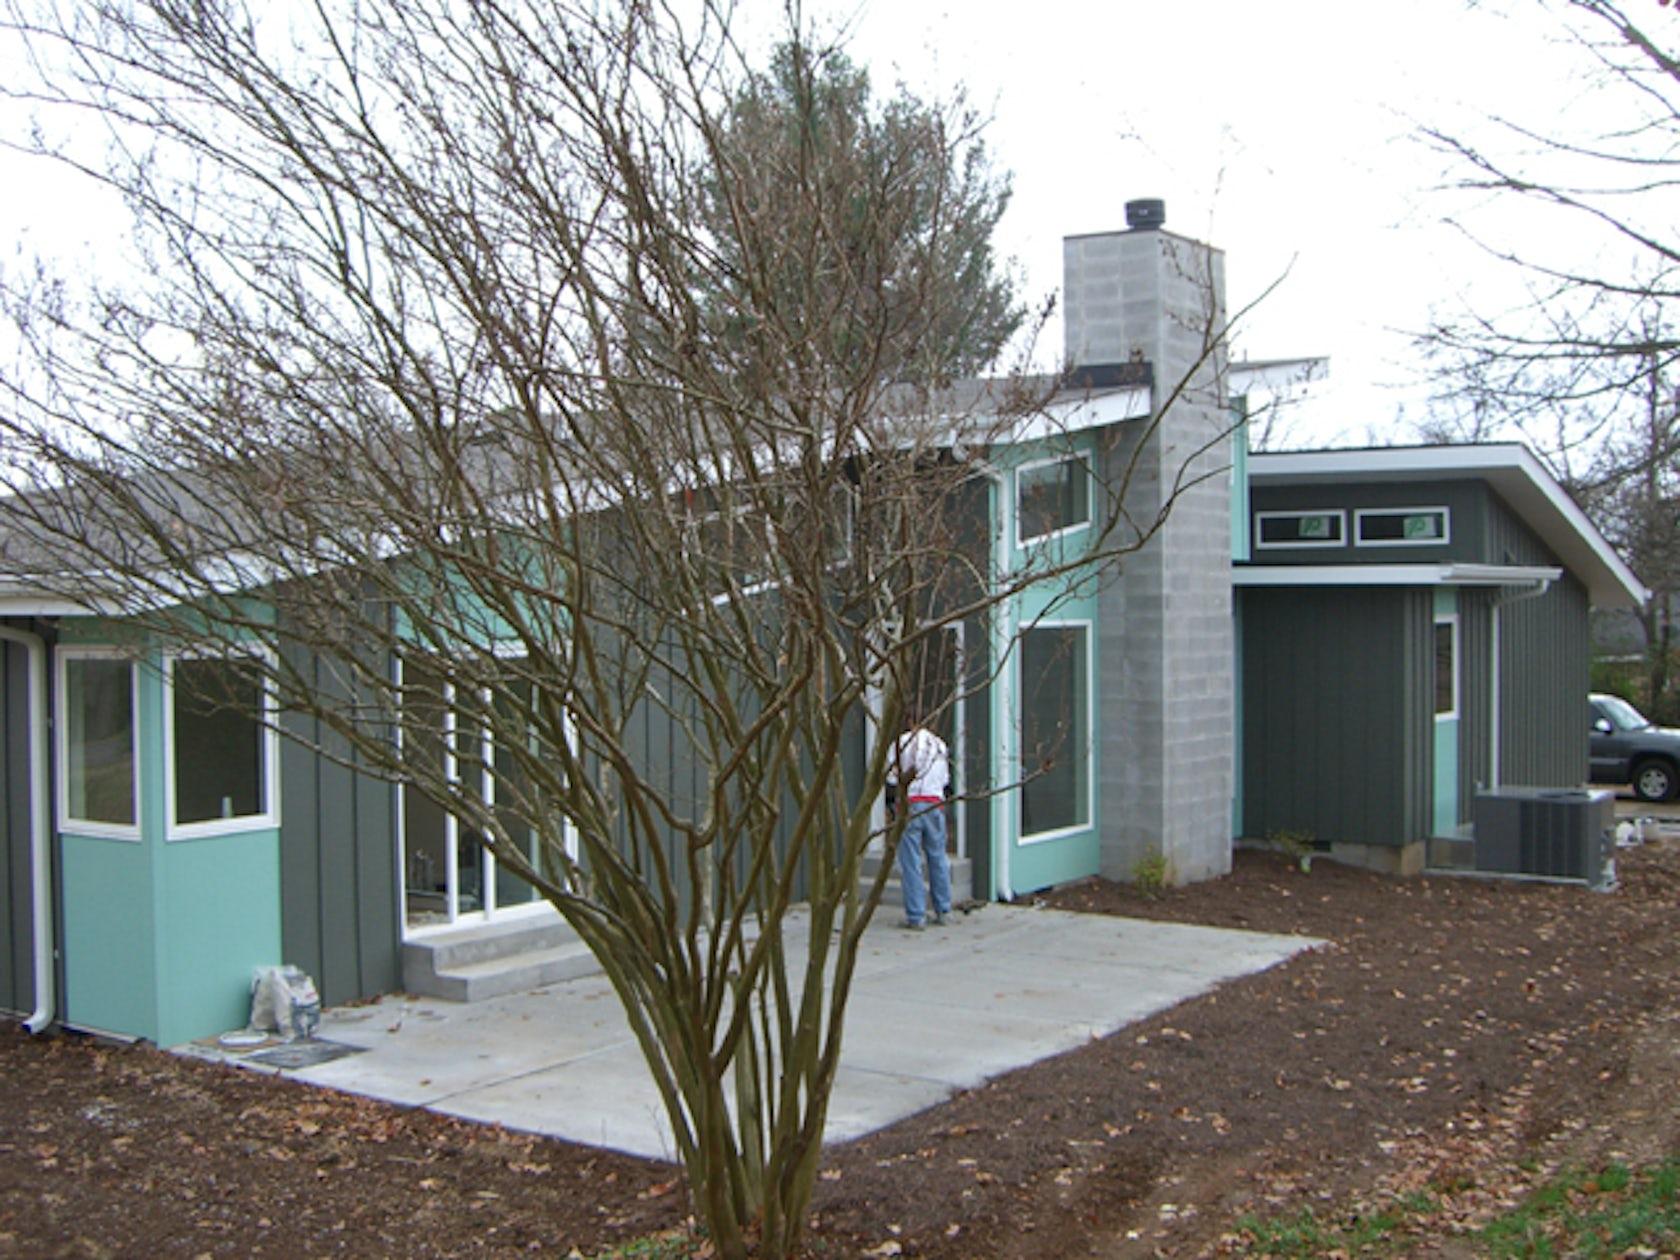 New mid century modern in east nashville architizer for New modern homes nashville tn